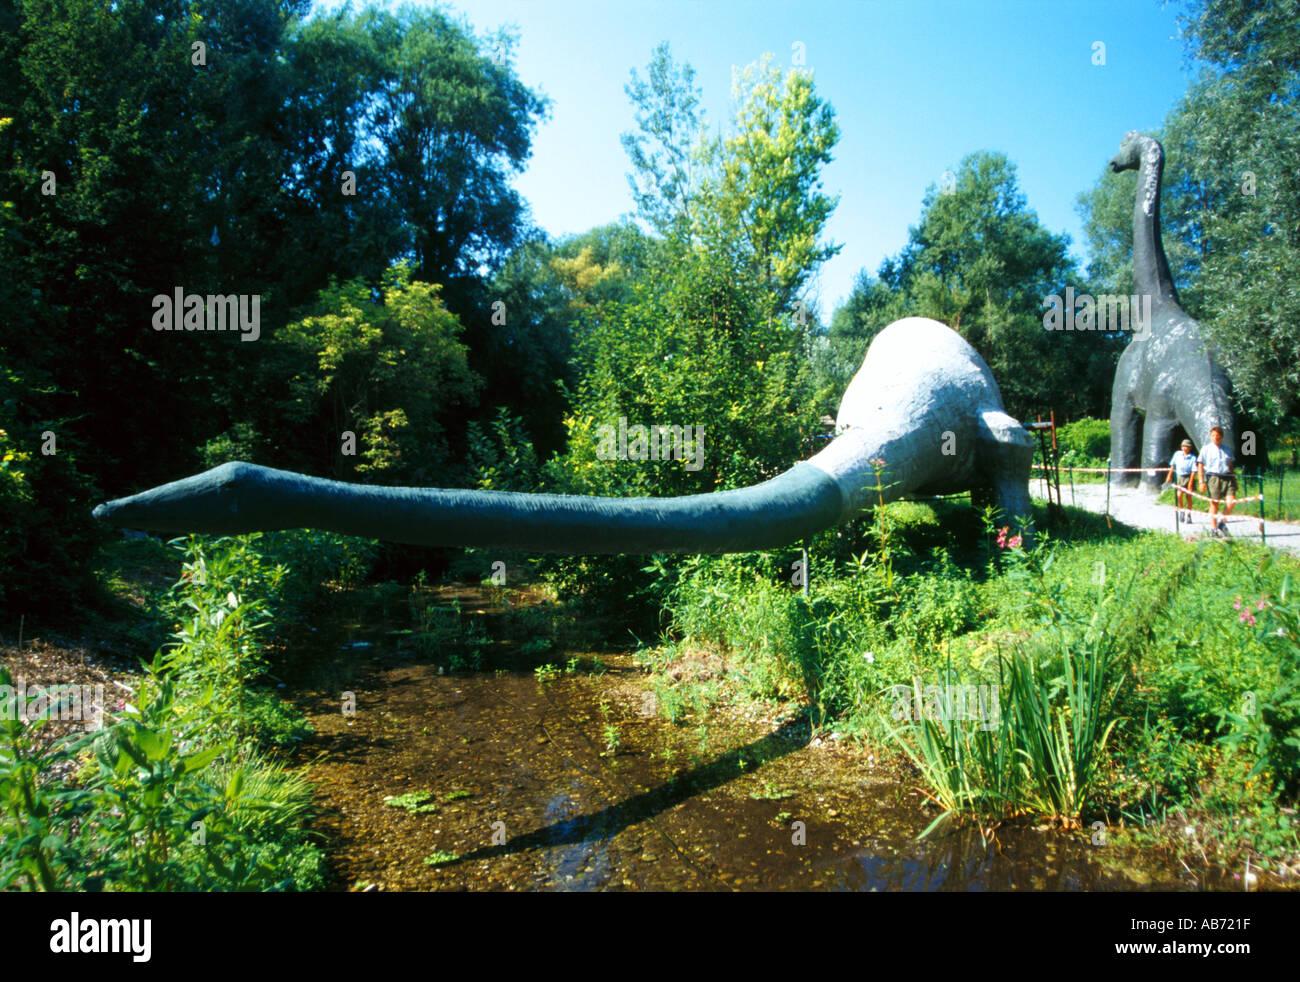 Austria jurassic park dinosaurier - Stock Image